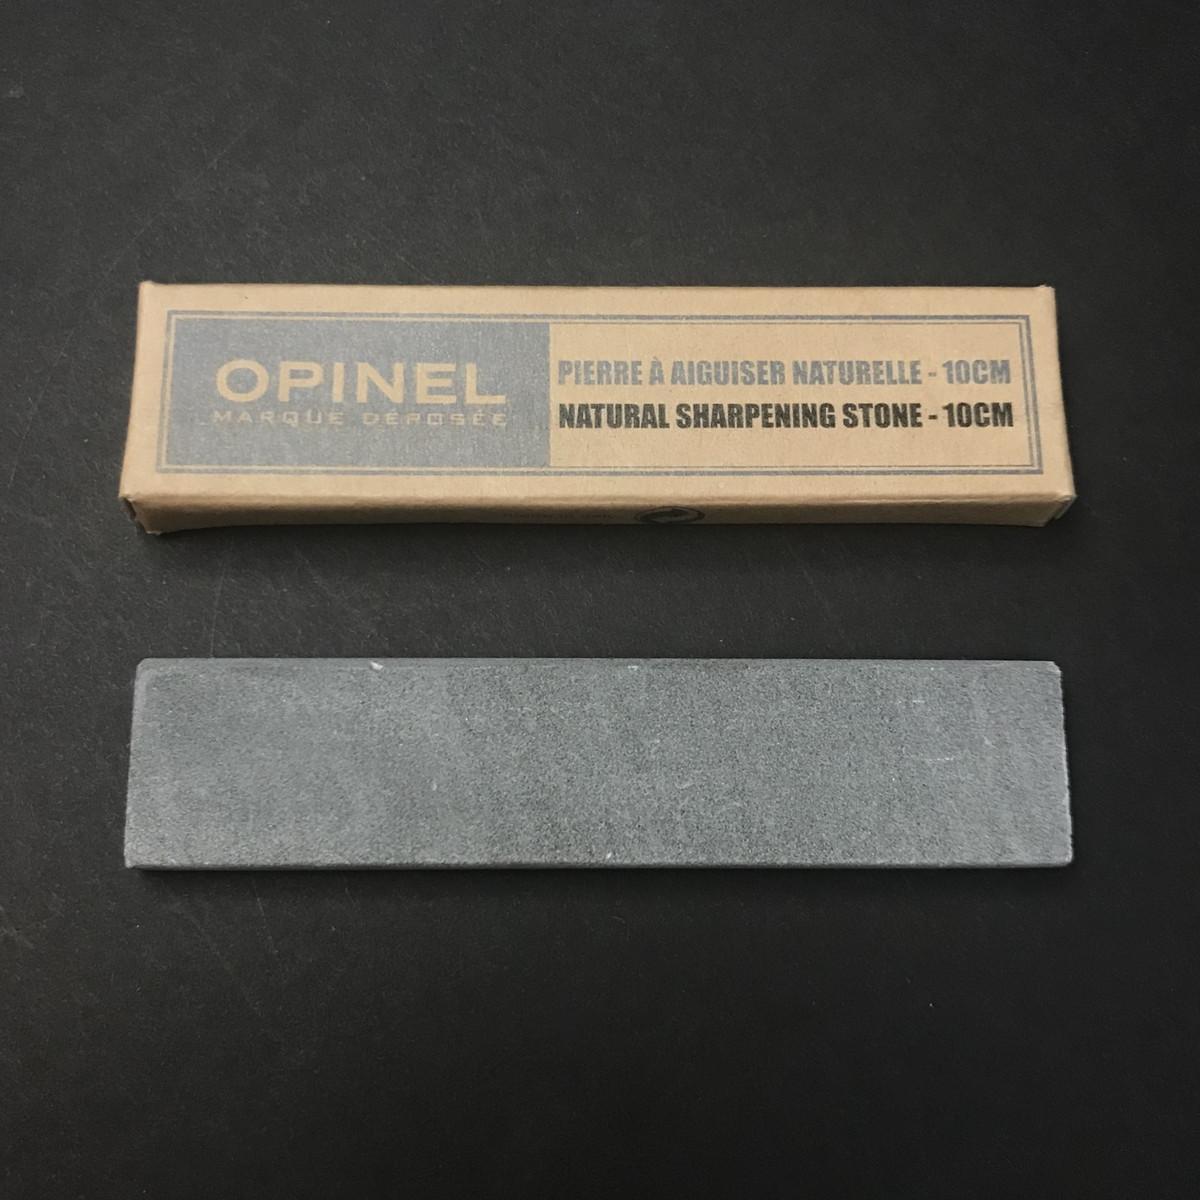 Opinel - Sharpening Stone